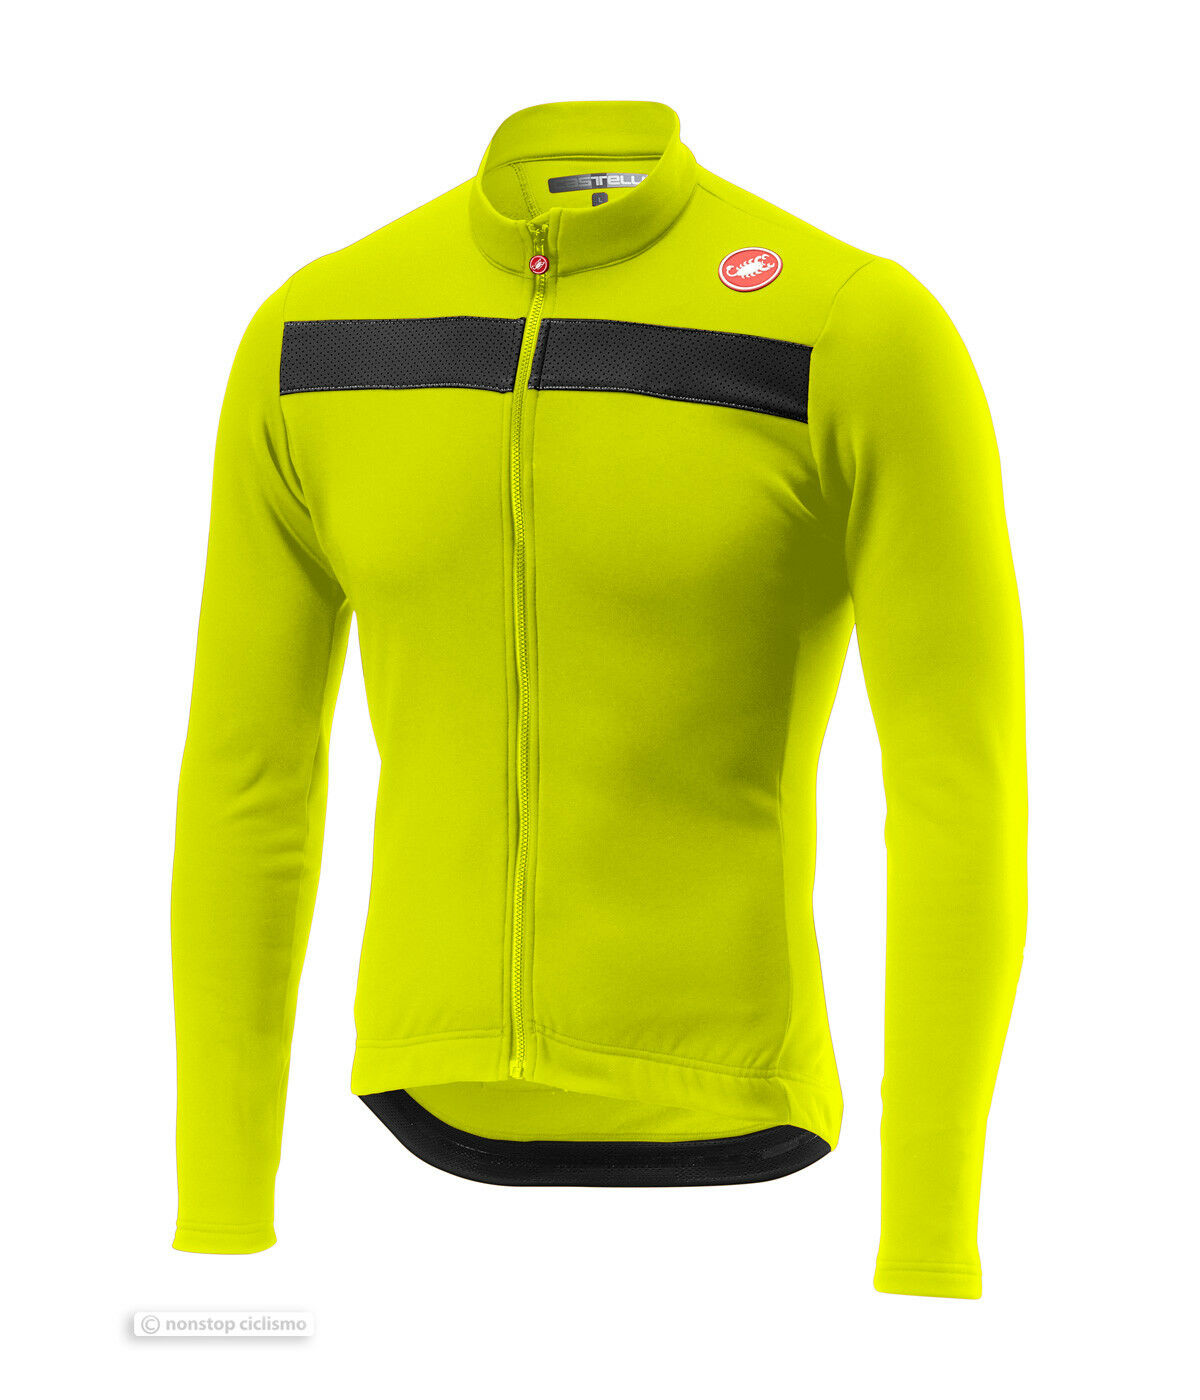 Nuevo Ciclismo Castelli puro 3 Manga Larga Jersey  Amarillo Fluo